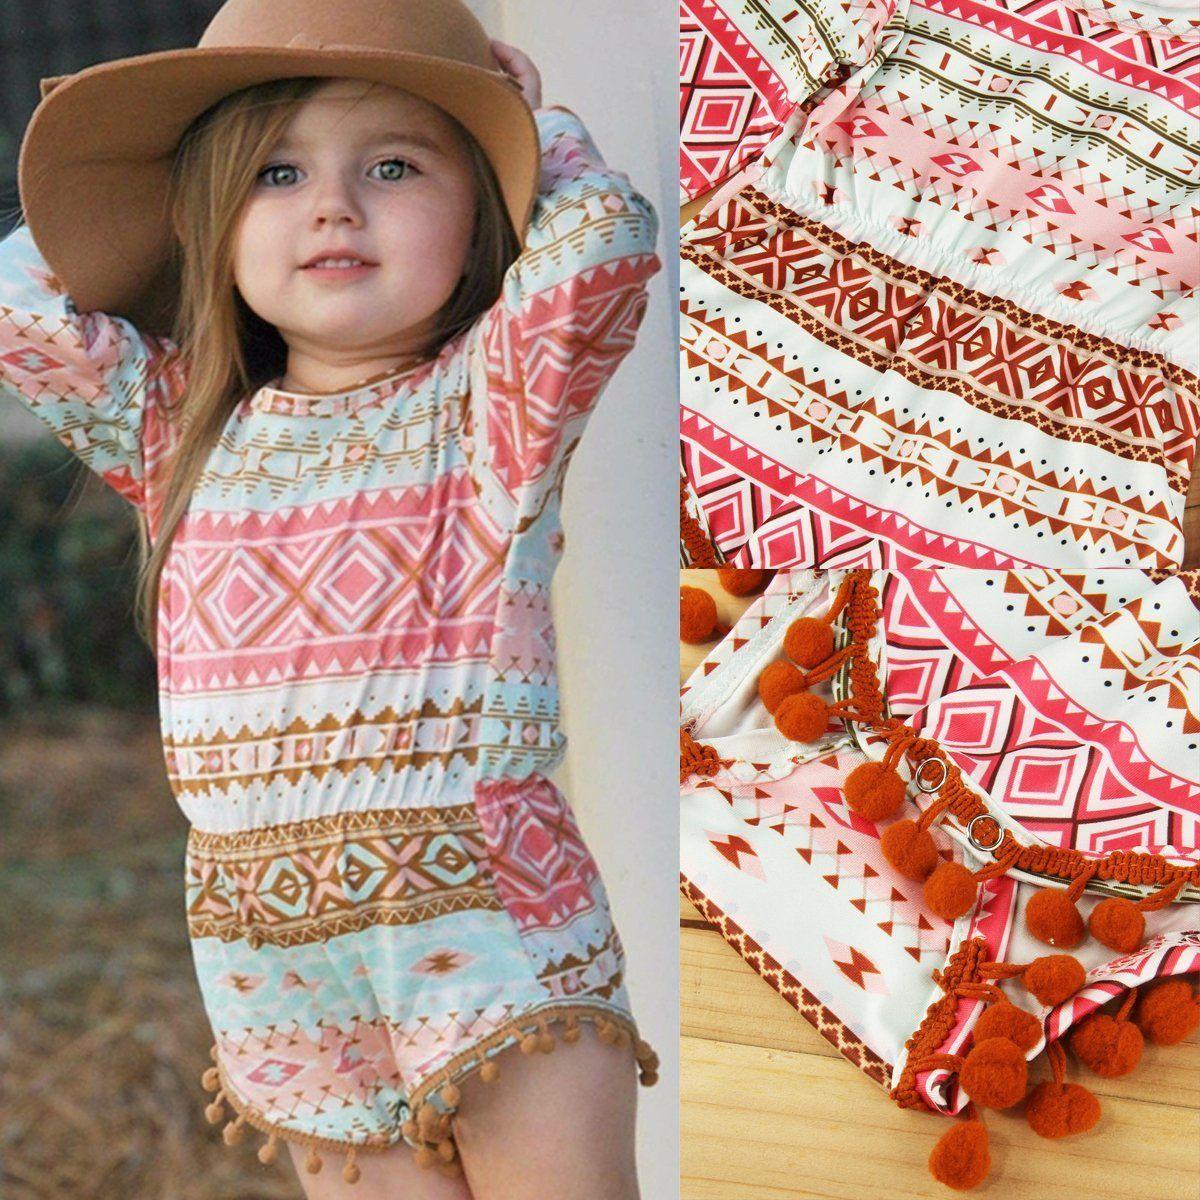 ed8598e9f Newborn Infant Baby Girl Clothes Jumpsuit Romper Bodysuit Sunsuit Toddler  Outfit